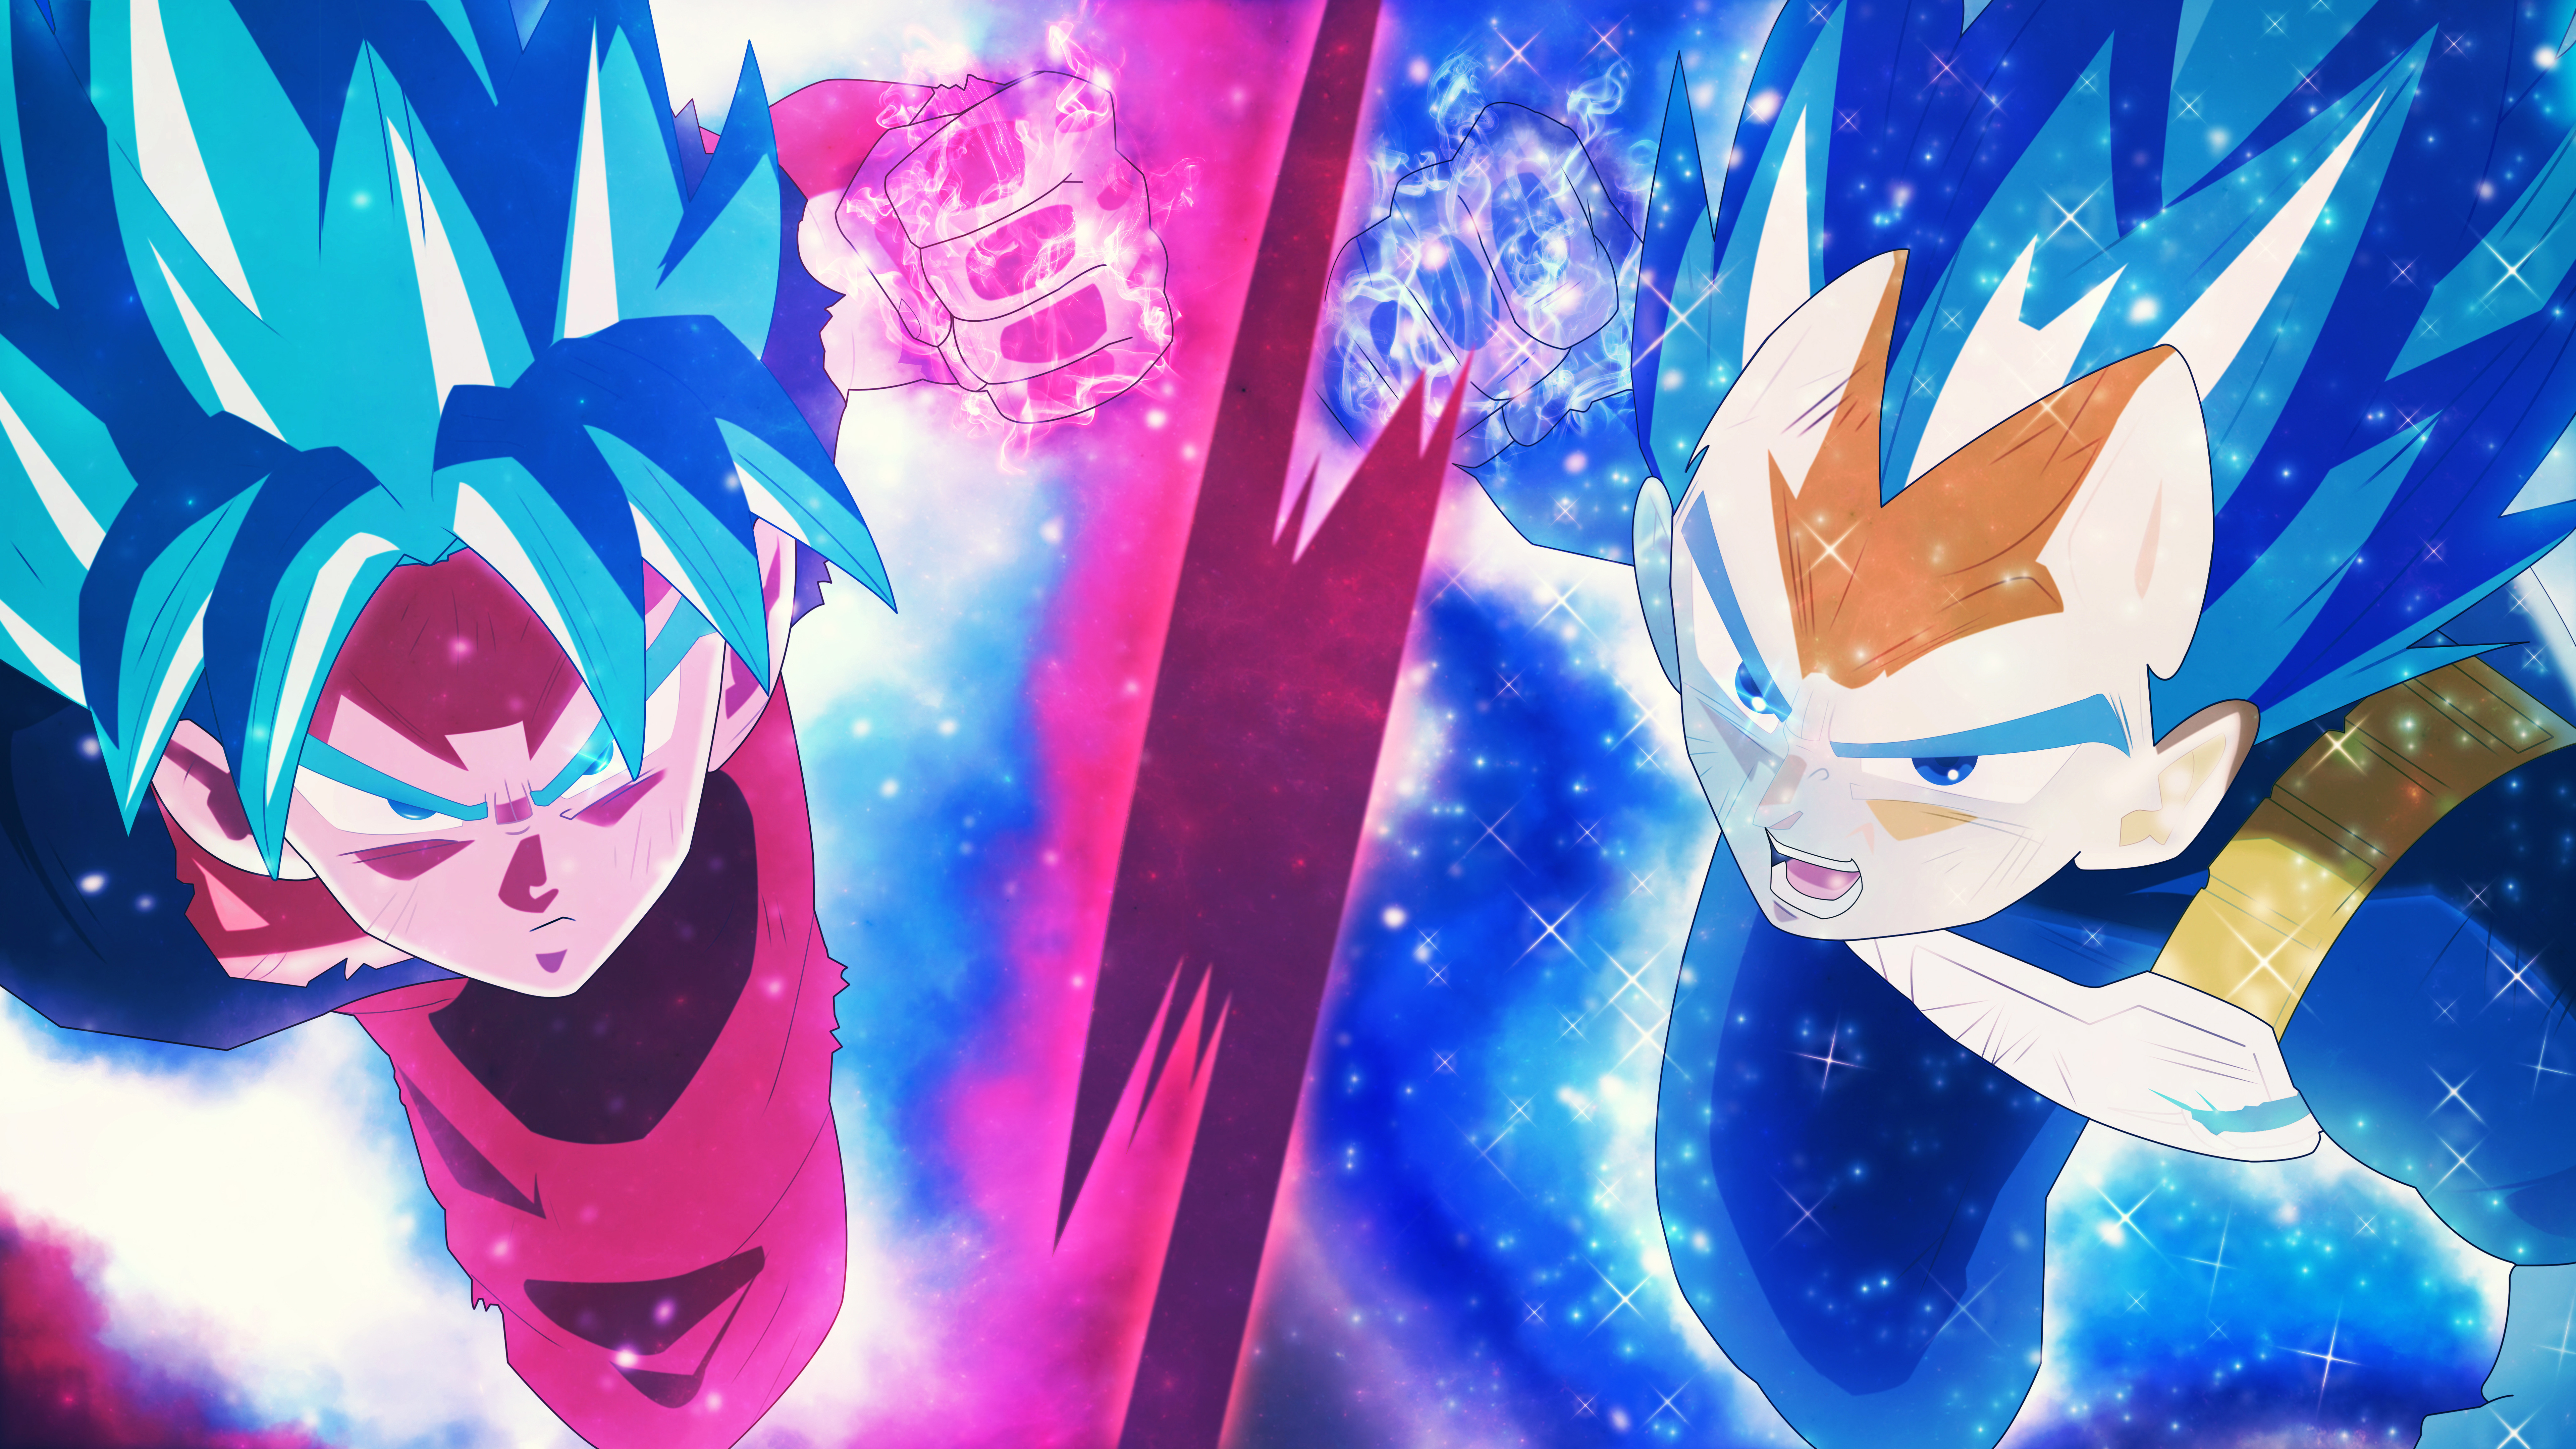 7680x4320 Dragon Ball Super Super Saiyan Blue 8k 8k Hd 4k